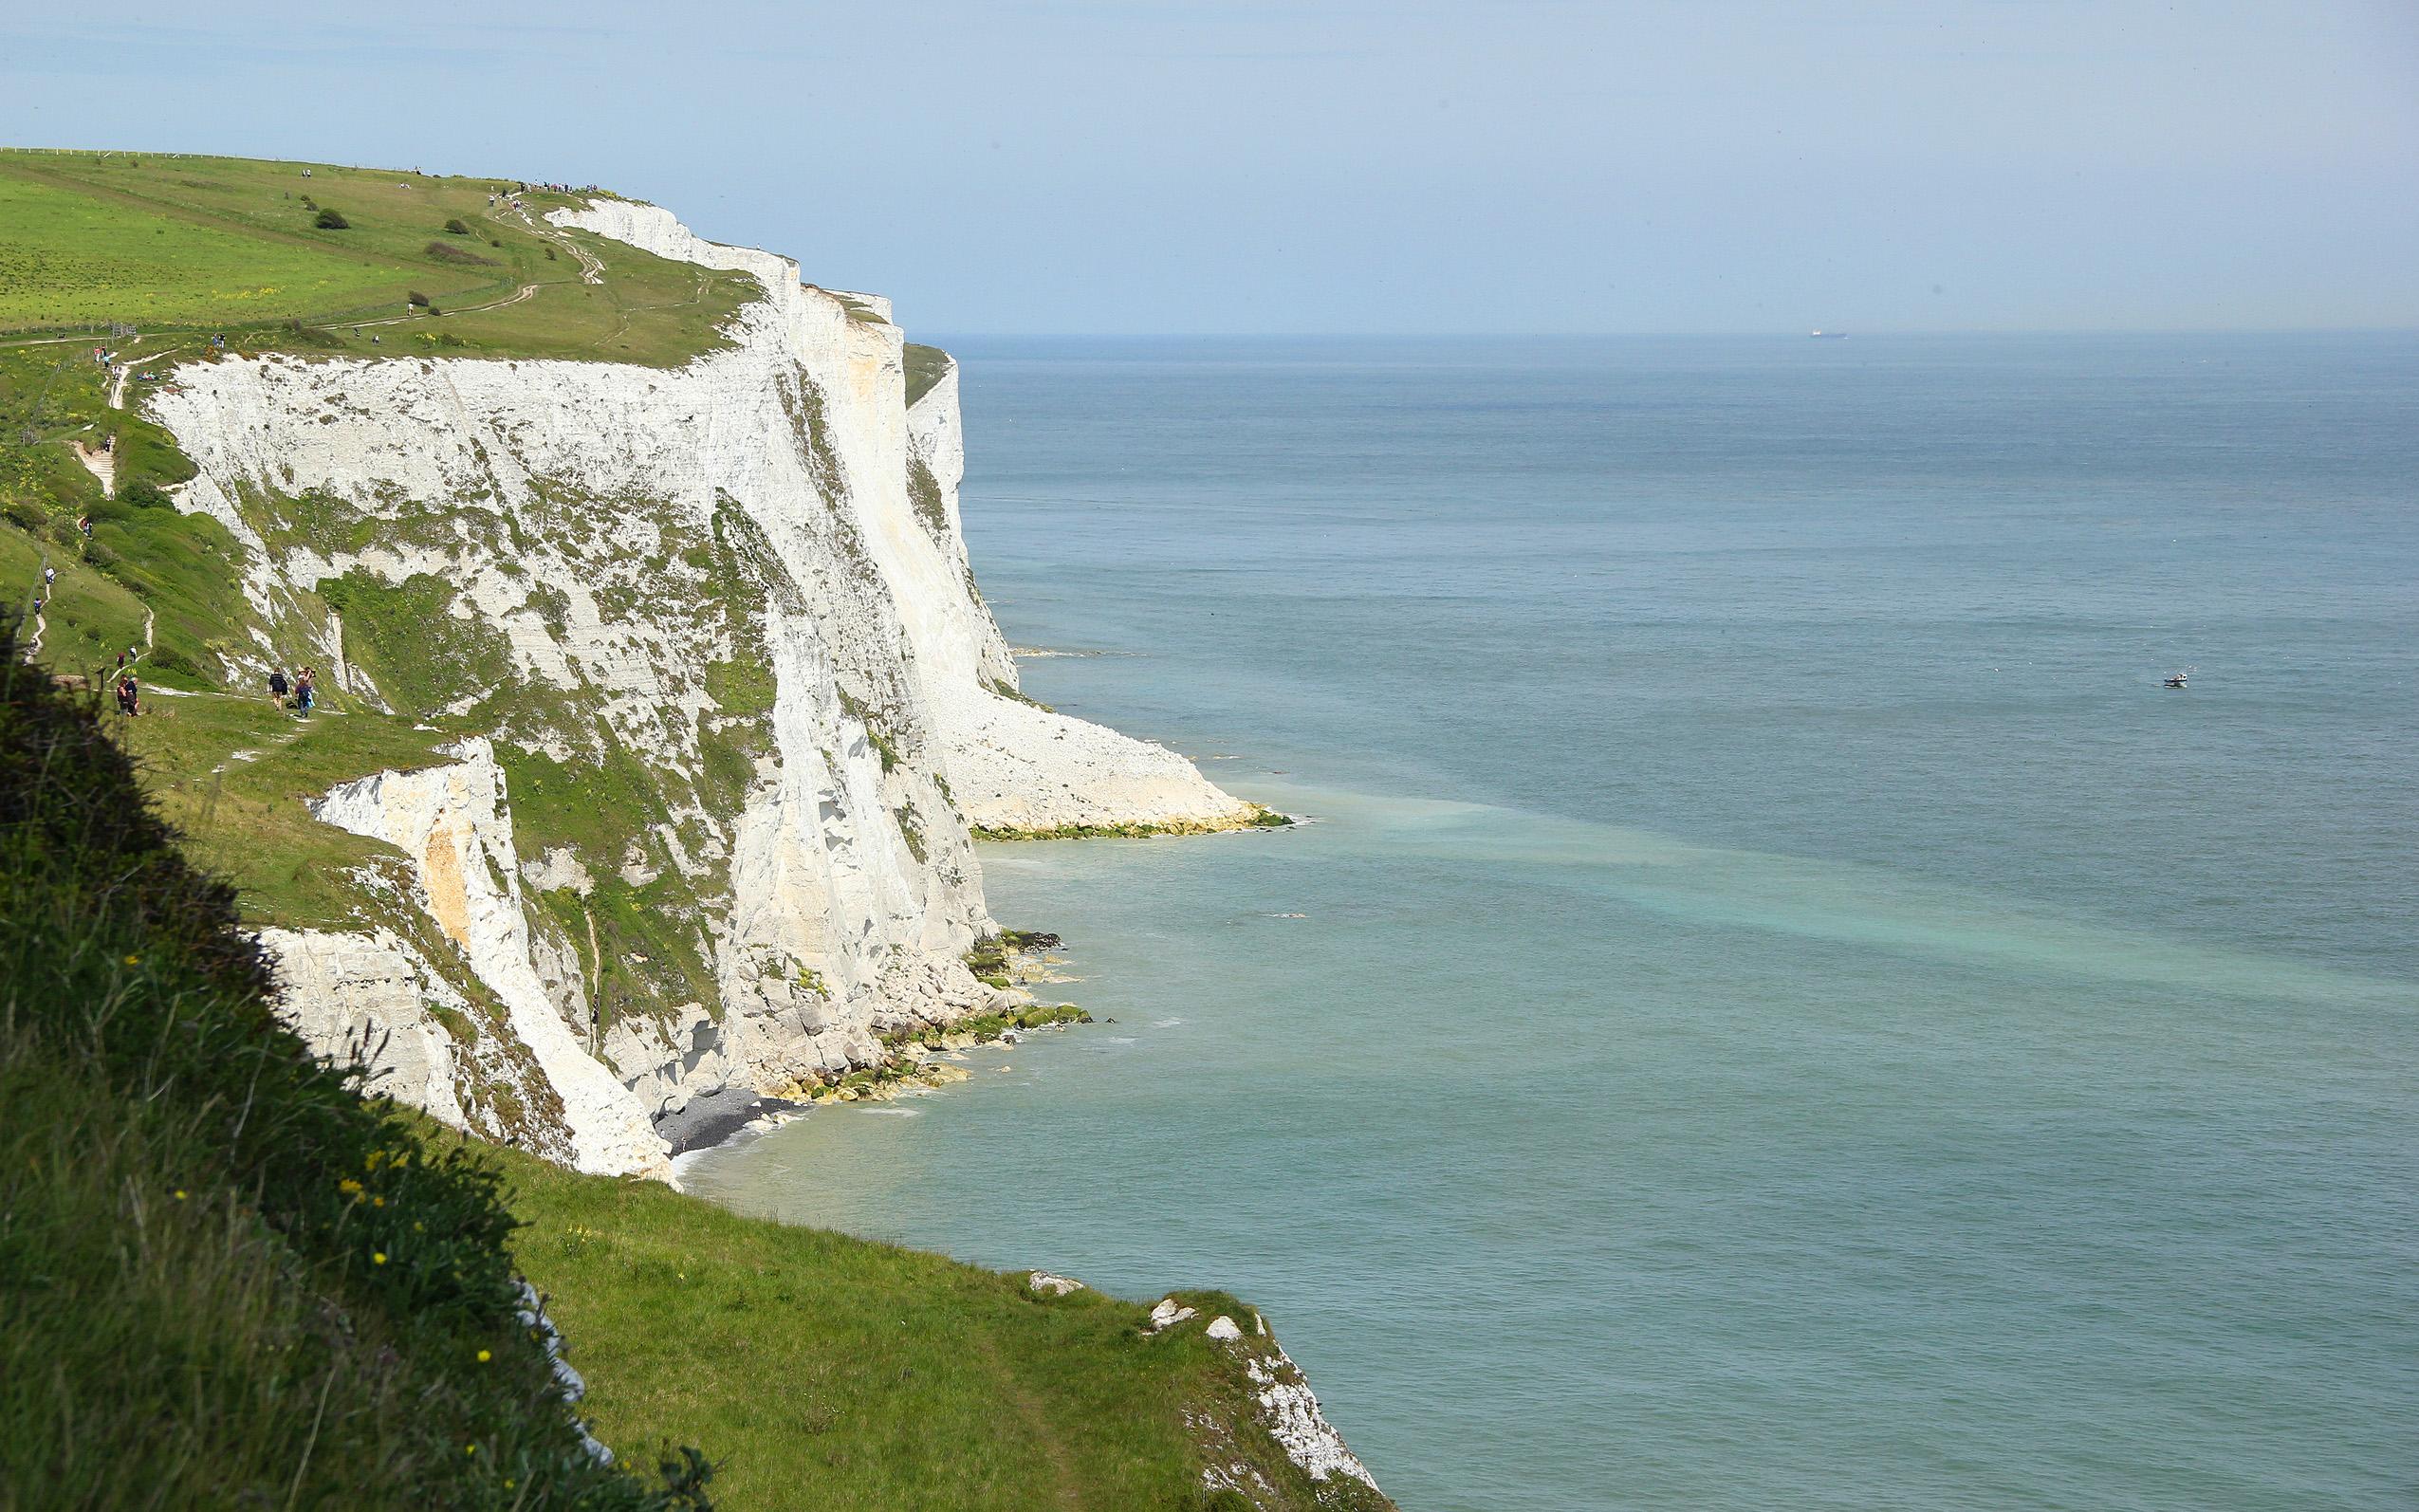 South East Coastal Splendour